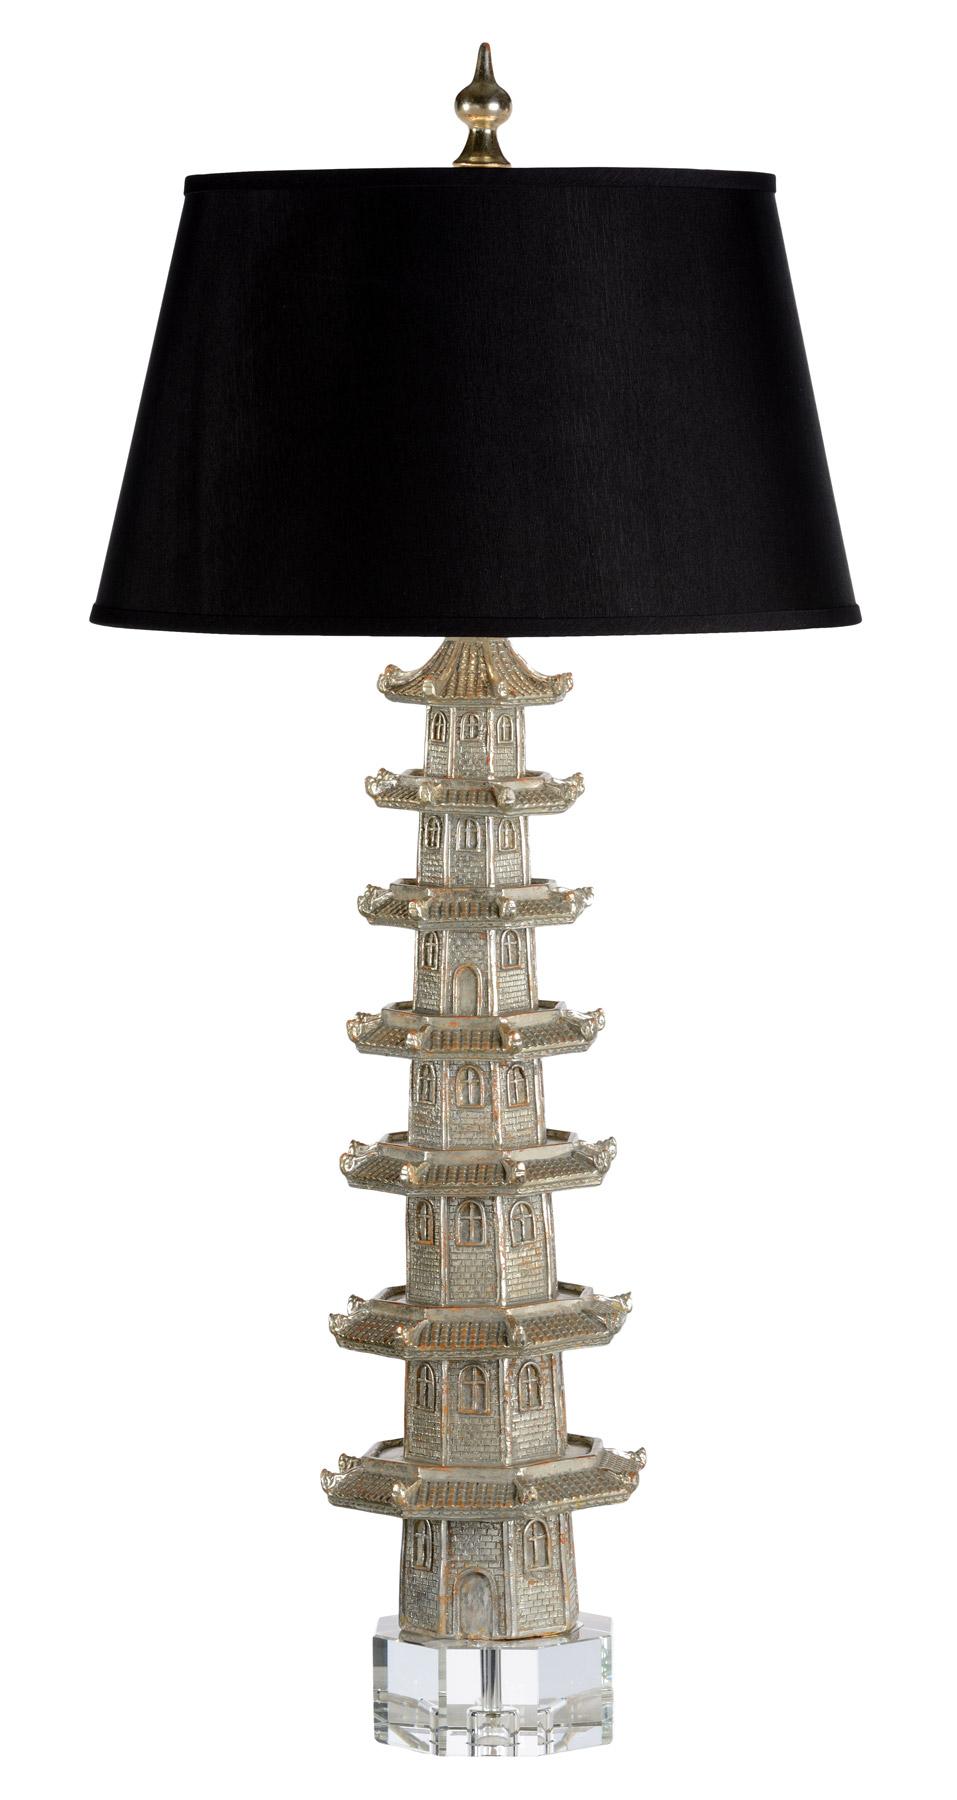 Wildwood 60428 Suzhou Tall Table Lamp Silver